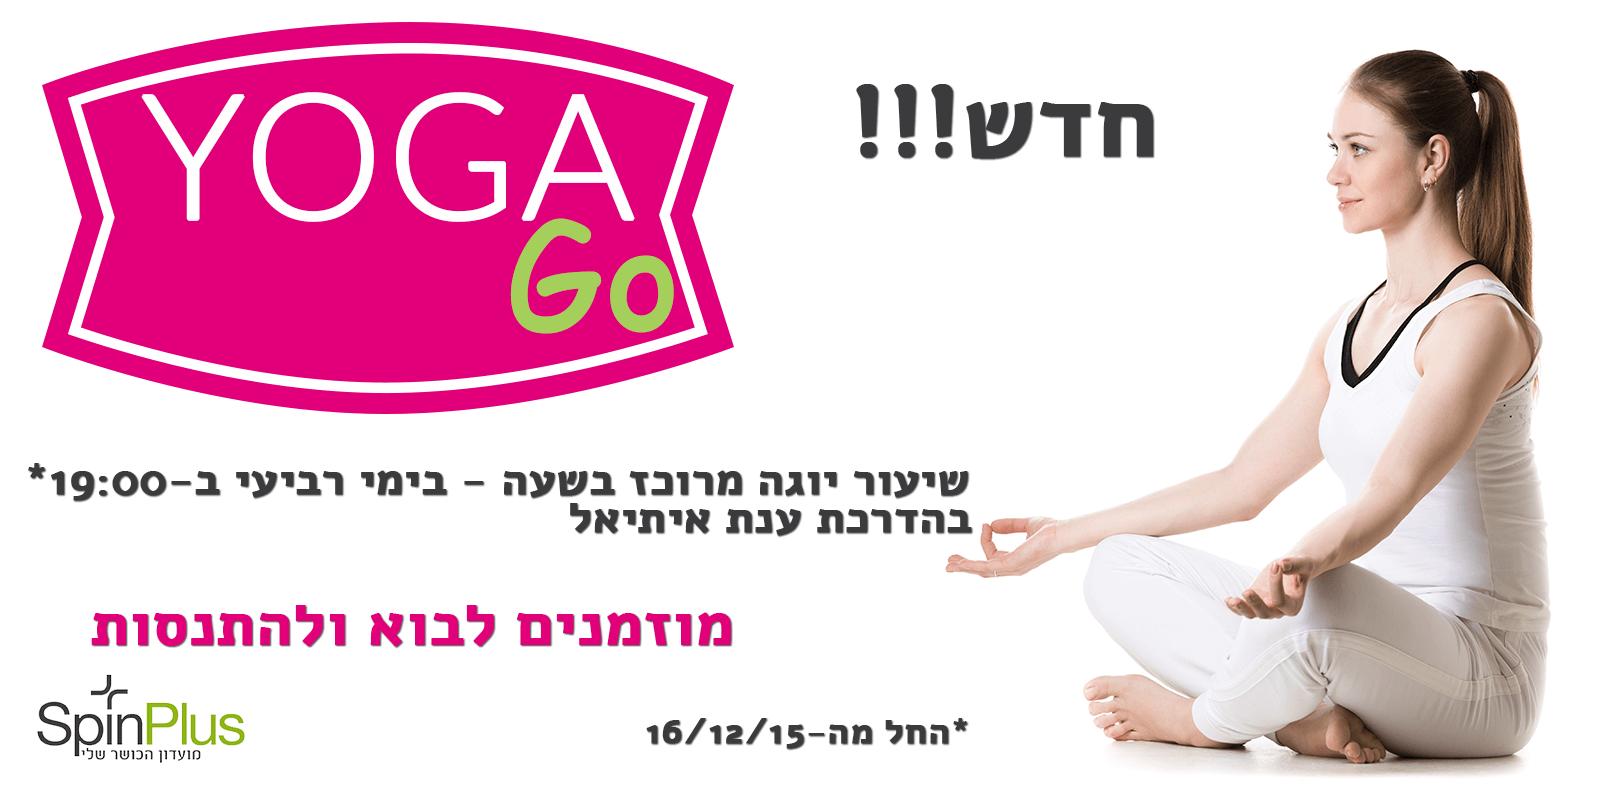 yoga-go (1).png